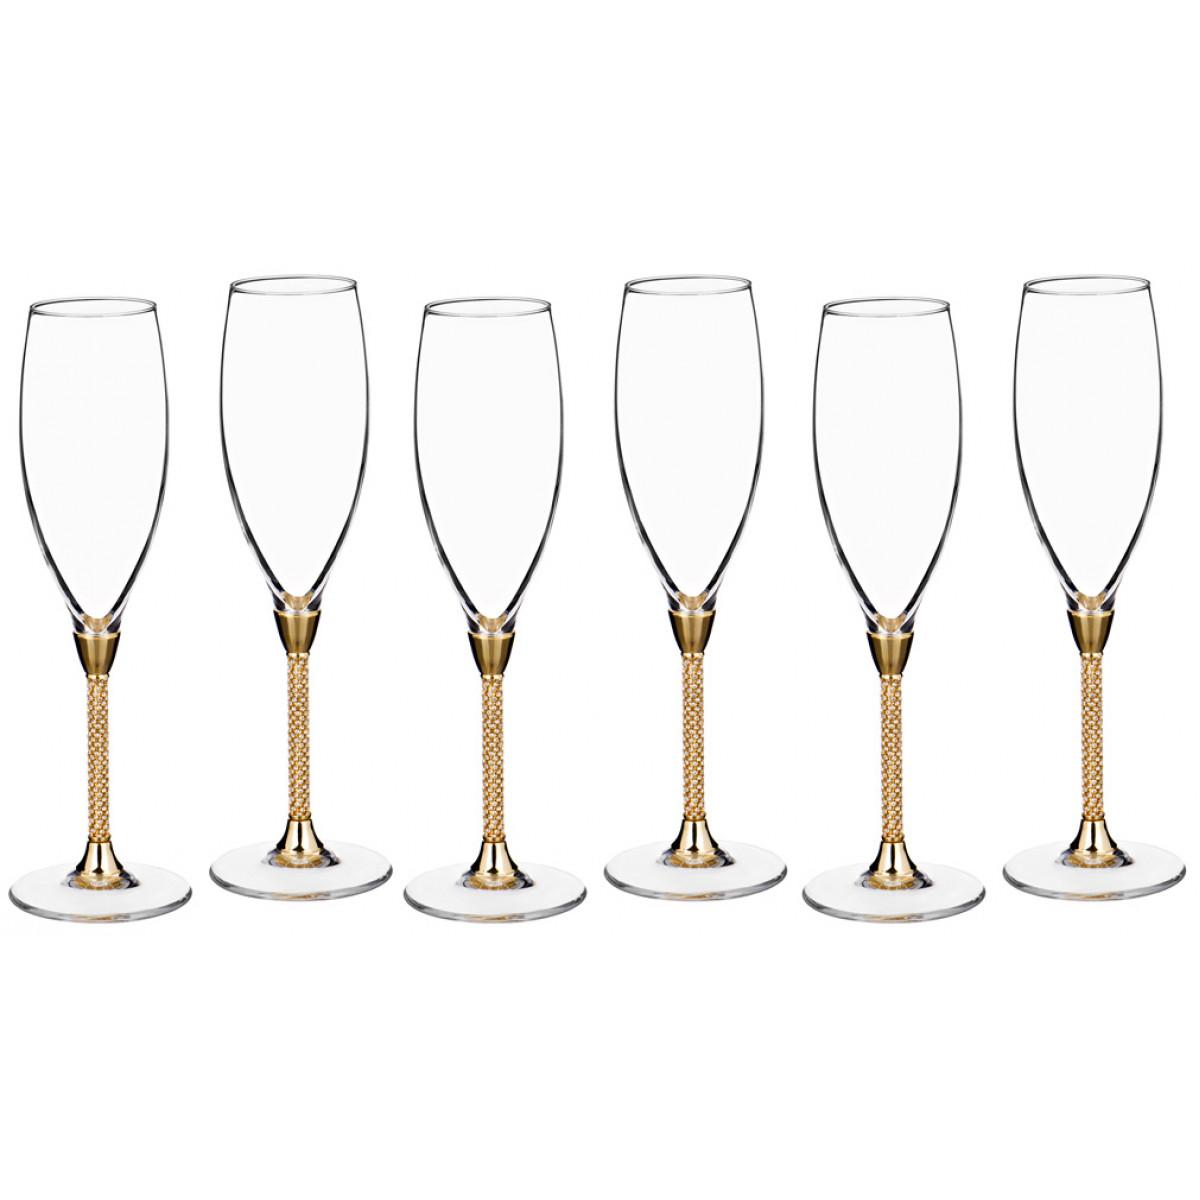 набор бокалов bistro д шампанского 2шт 275мл стекло {} Claret Набор бокалов для шампанского Lexia  (25 см - 6 шт)